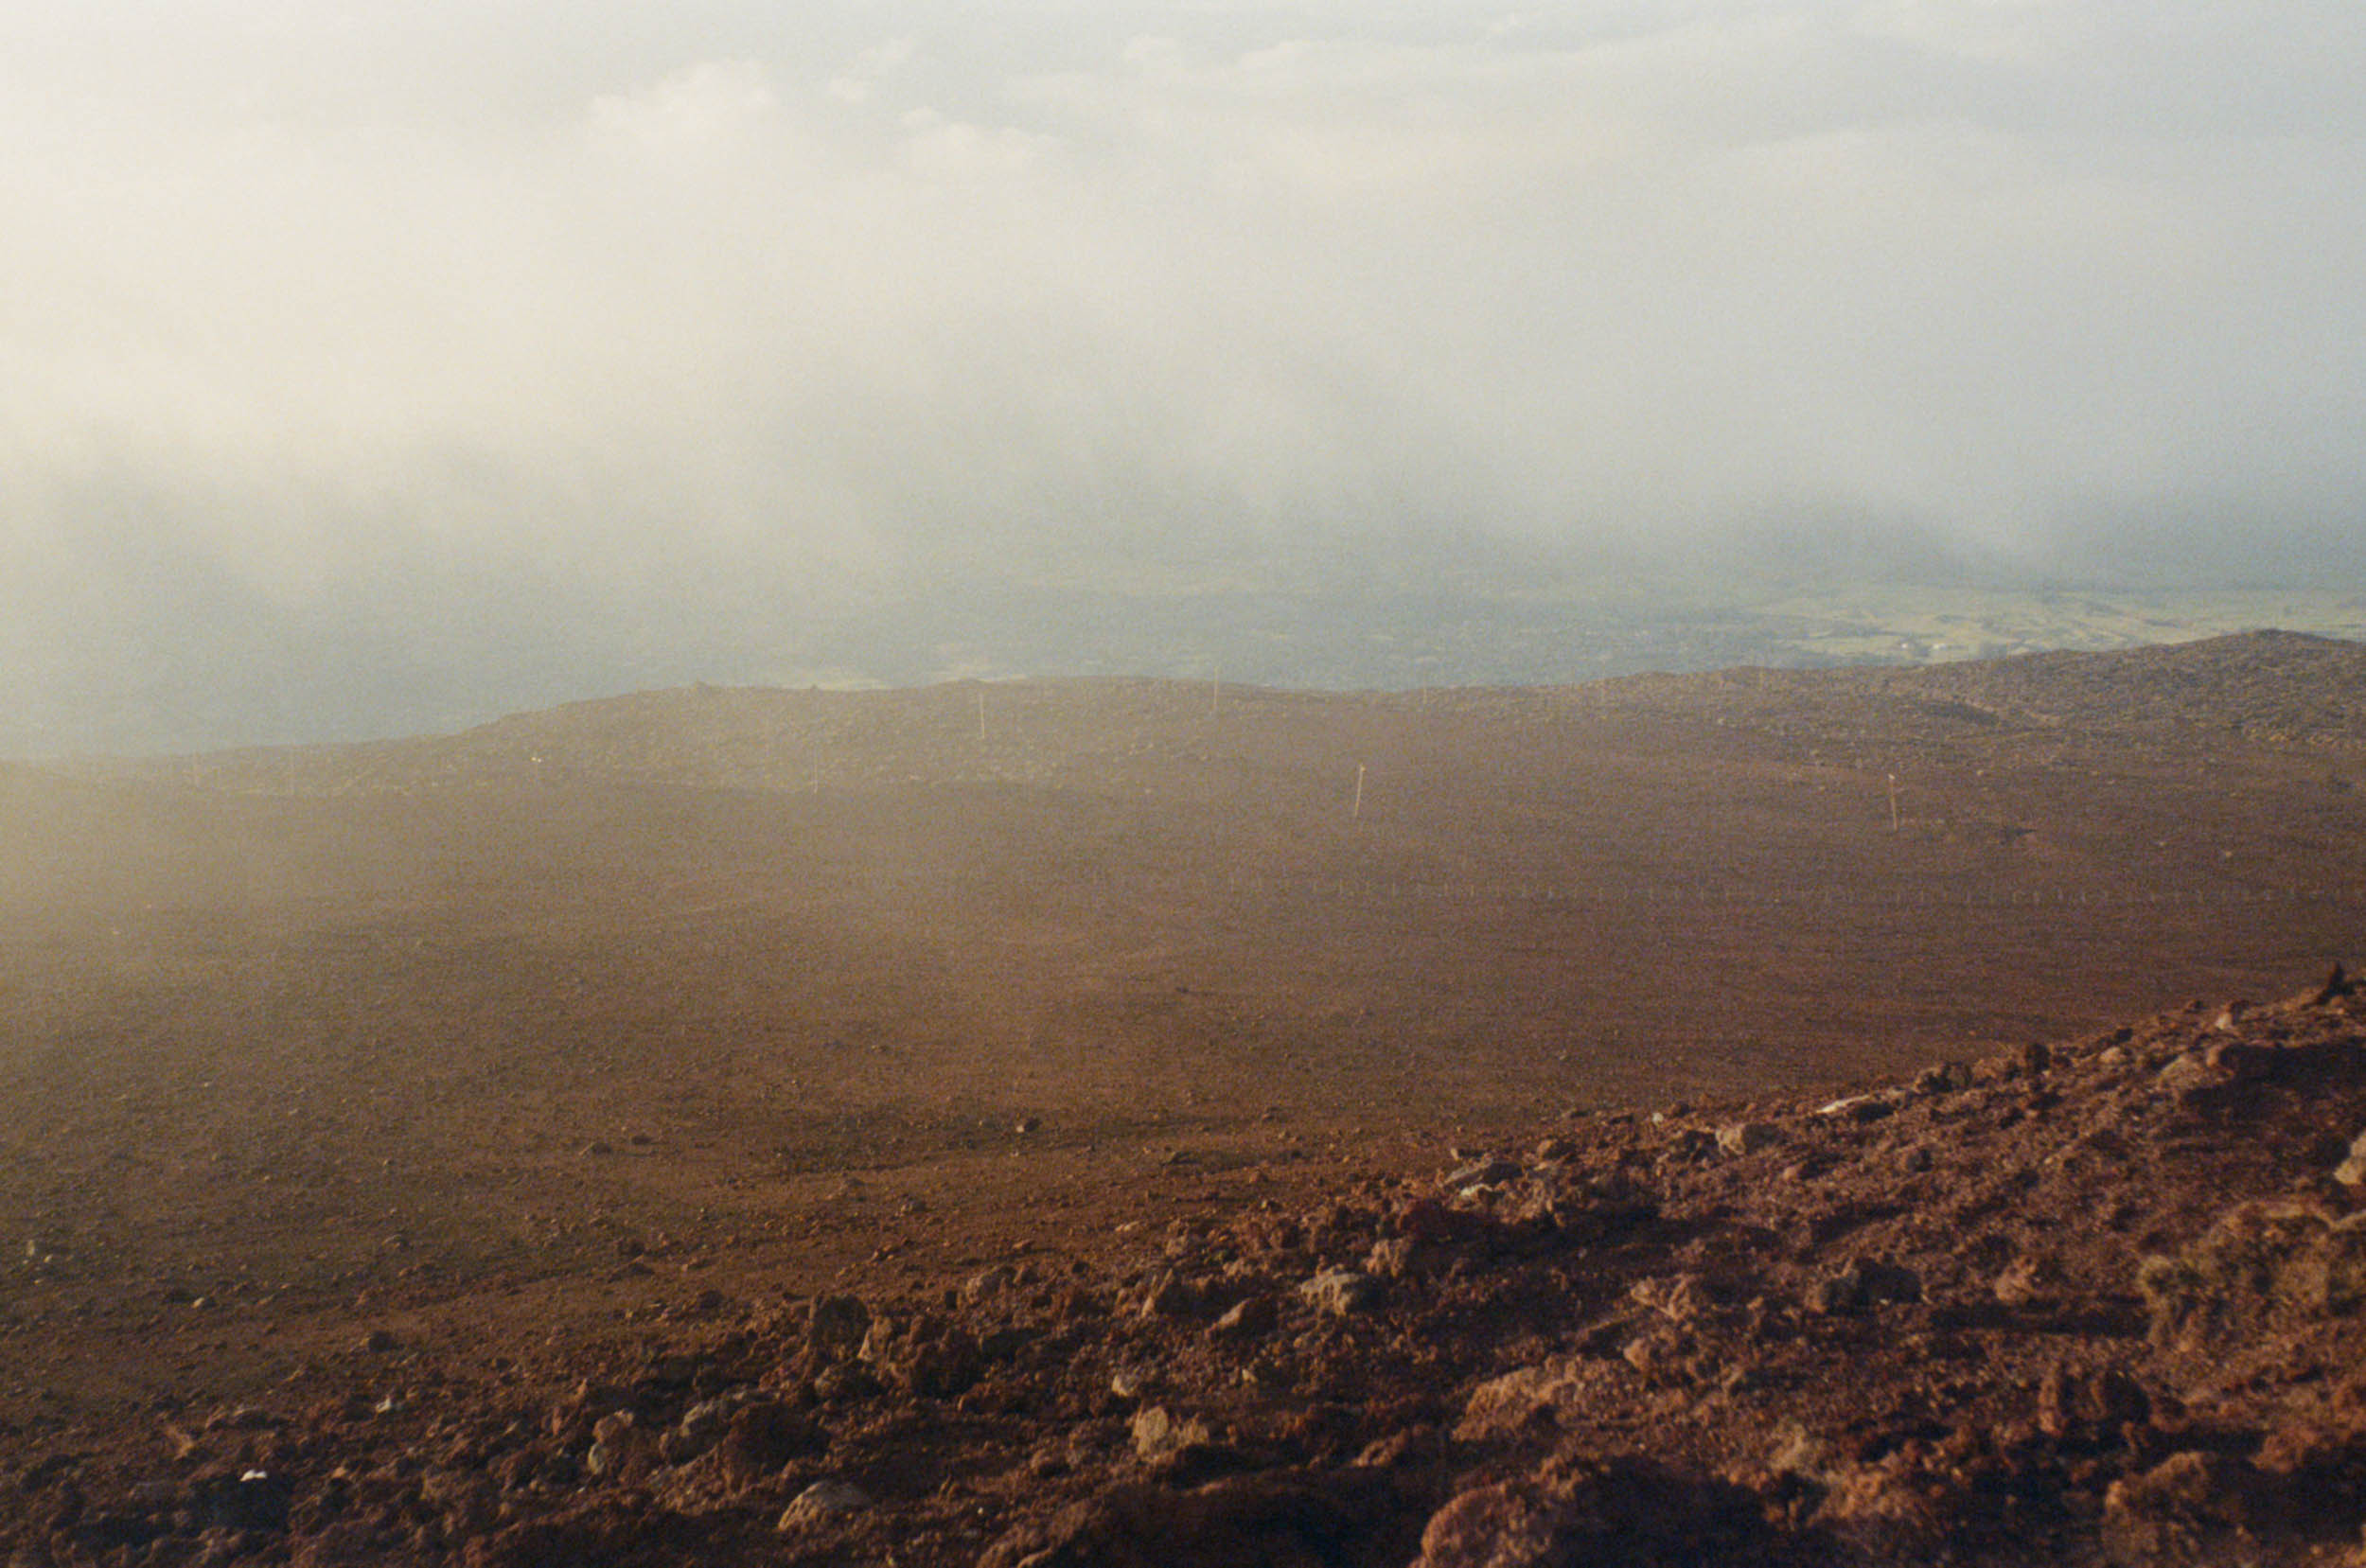 35mm_Maui-19.jpg